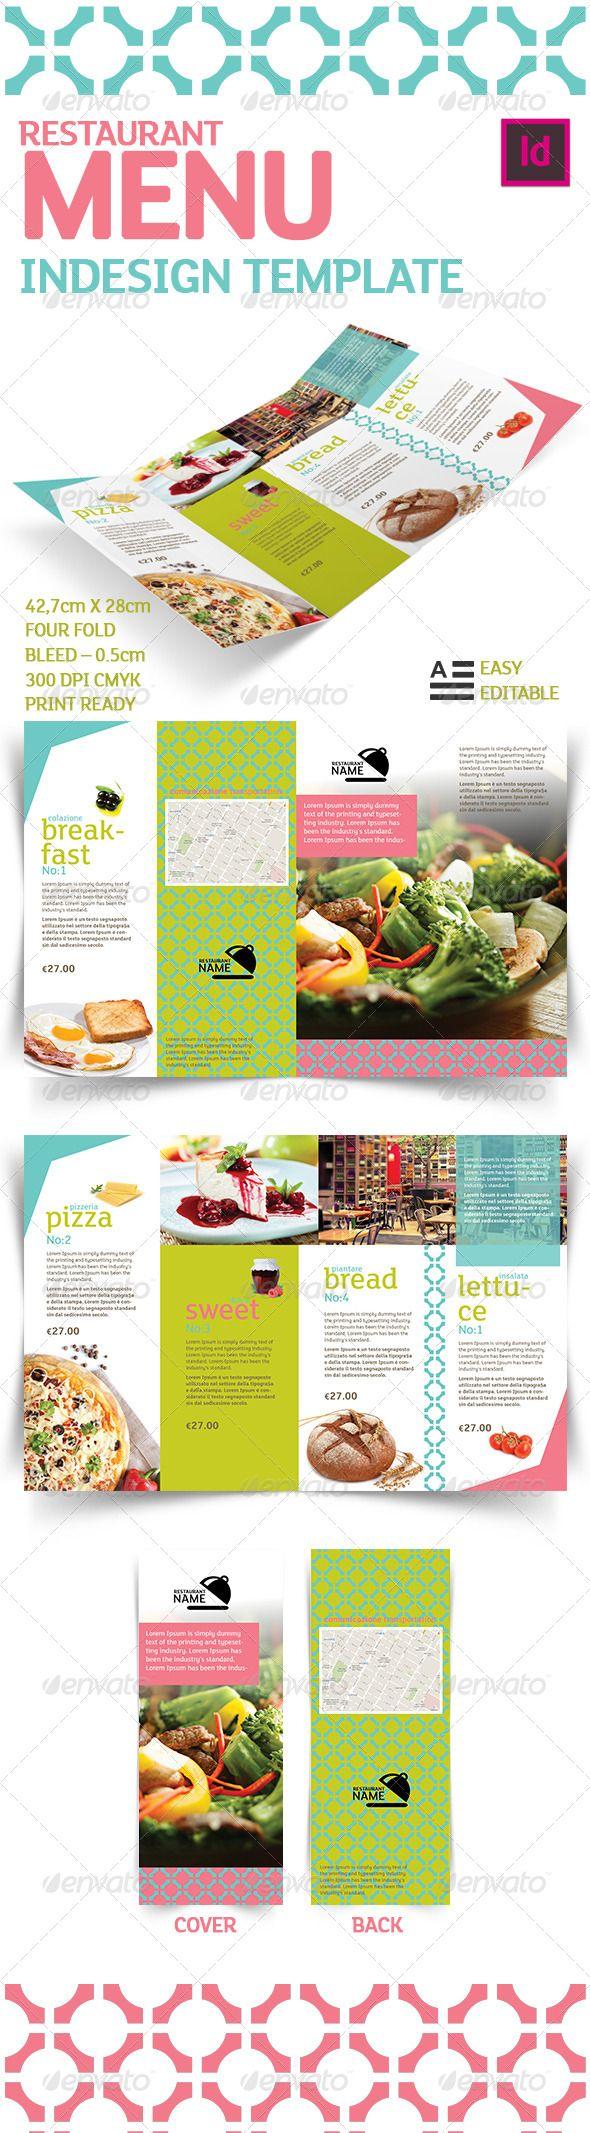 Restaurant Menu Indesign Template - Food Menus Print Templates Download here : http://graphicriver.net/item/restaurant-menu-indesign-template/5744939?s_rank=1292&ref=Al-fatih